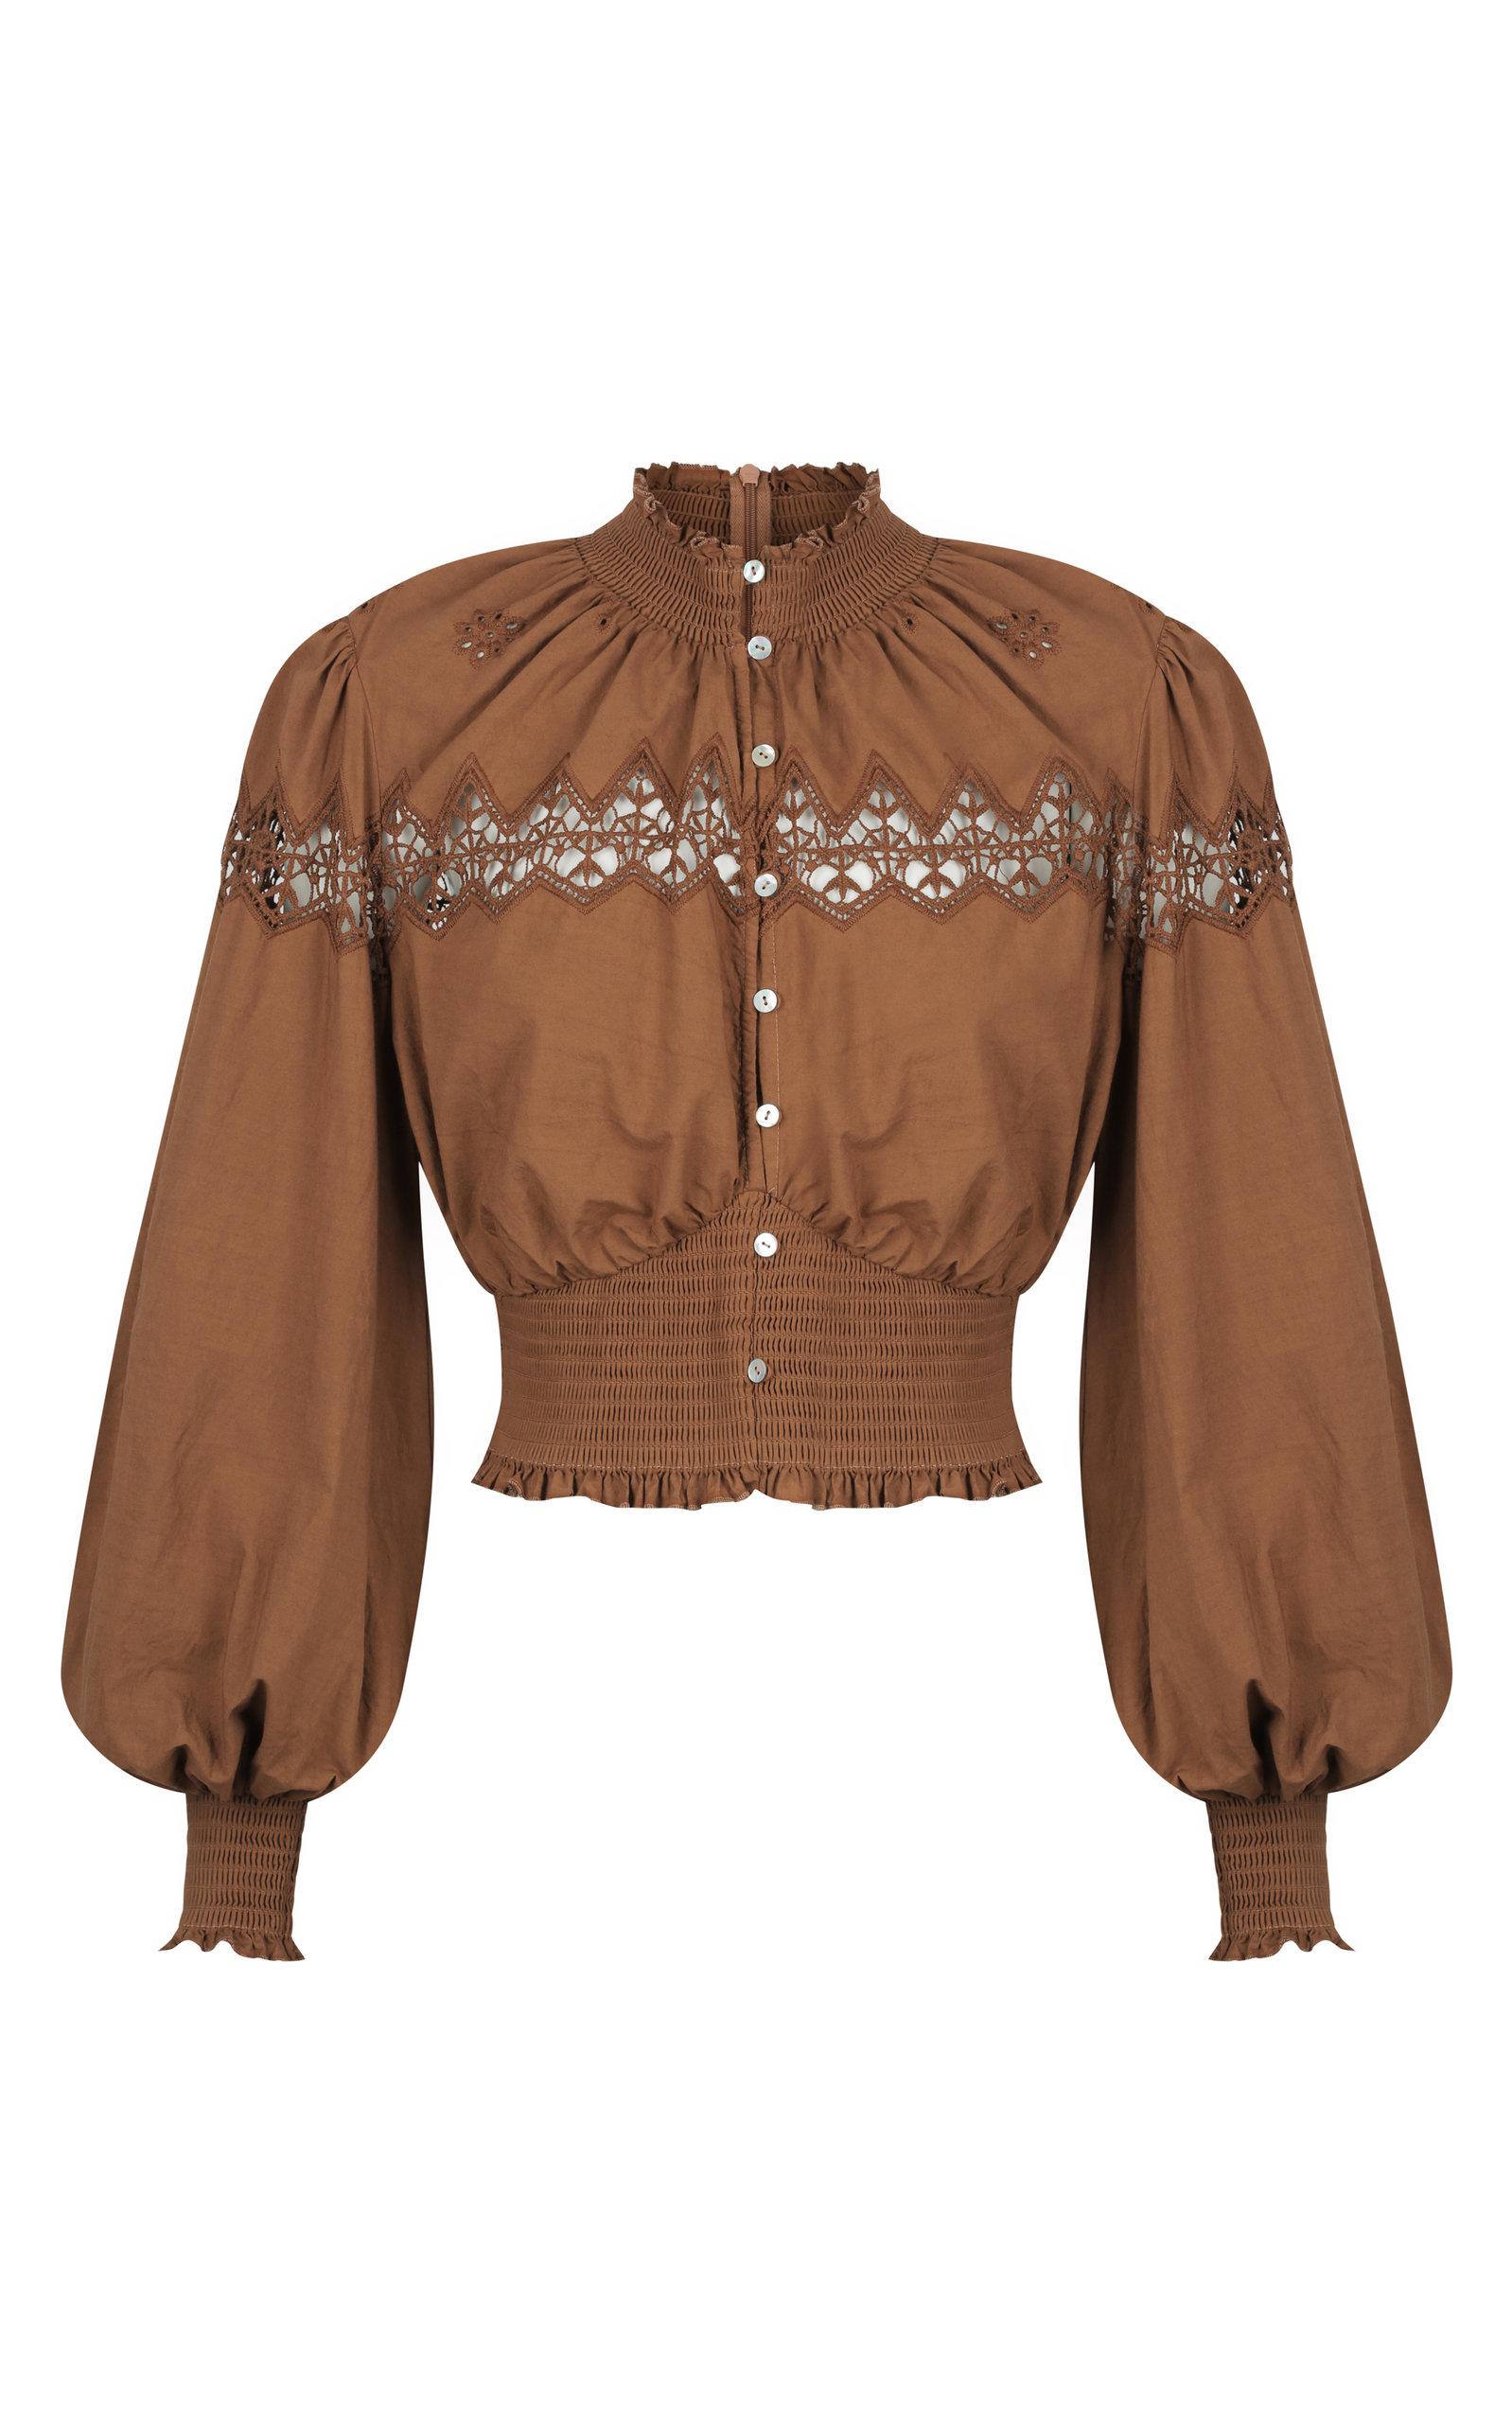 ALÉMAIS - Women's Julietta Lace-Detailed Cotton Top - Brown - Moda Operandi